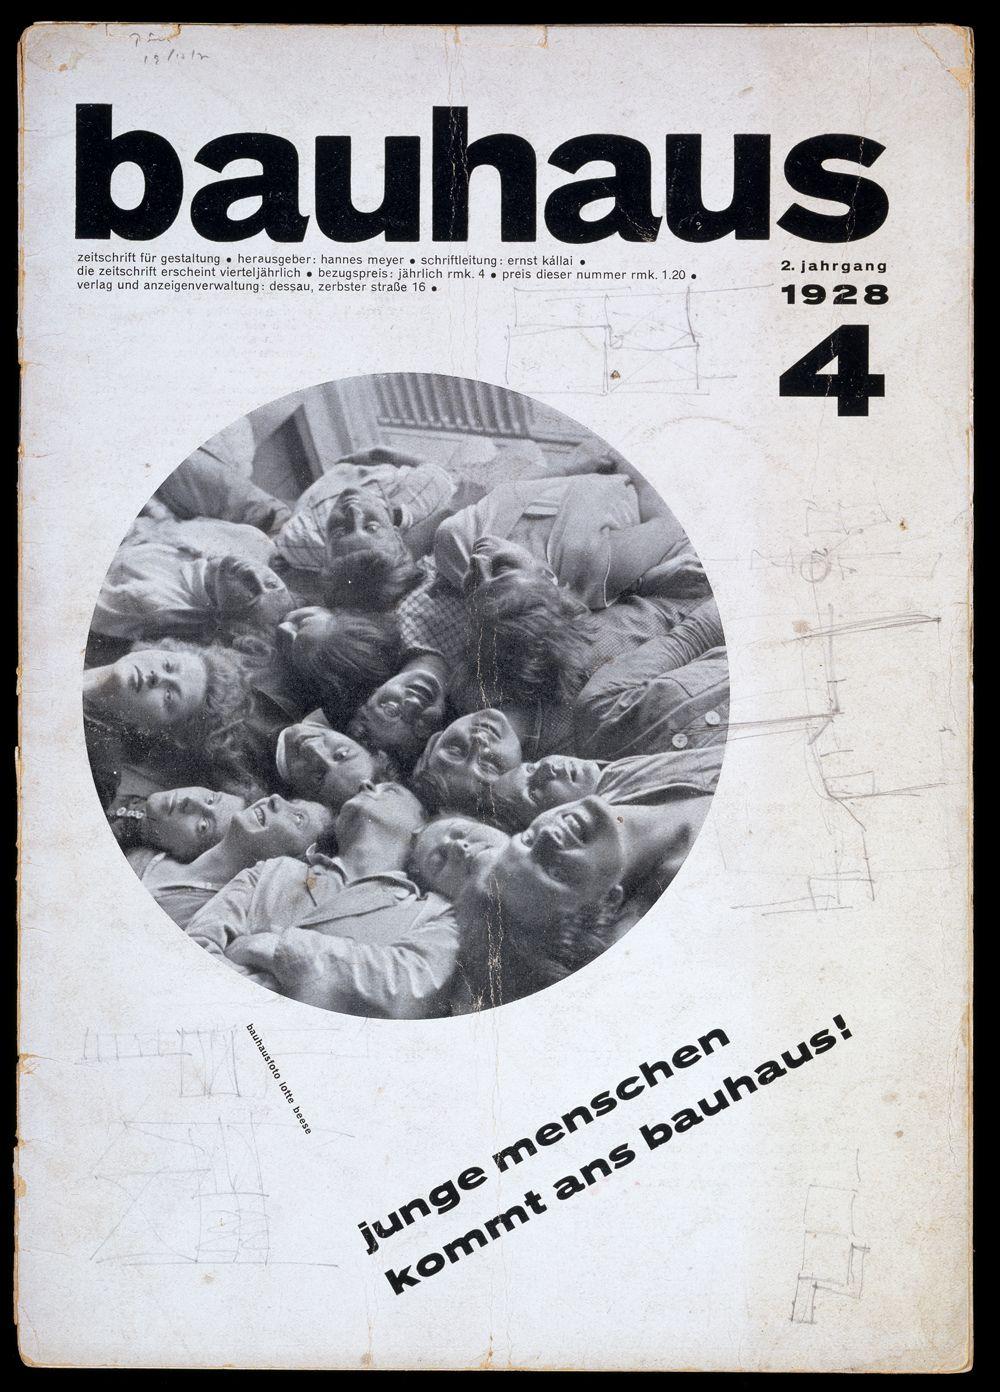 Bauhaus magazine vol 2 no 4 1928 joost schmidt 1893 for Bauhaus replica deutschland